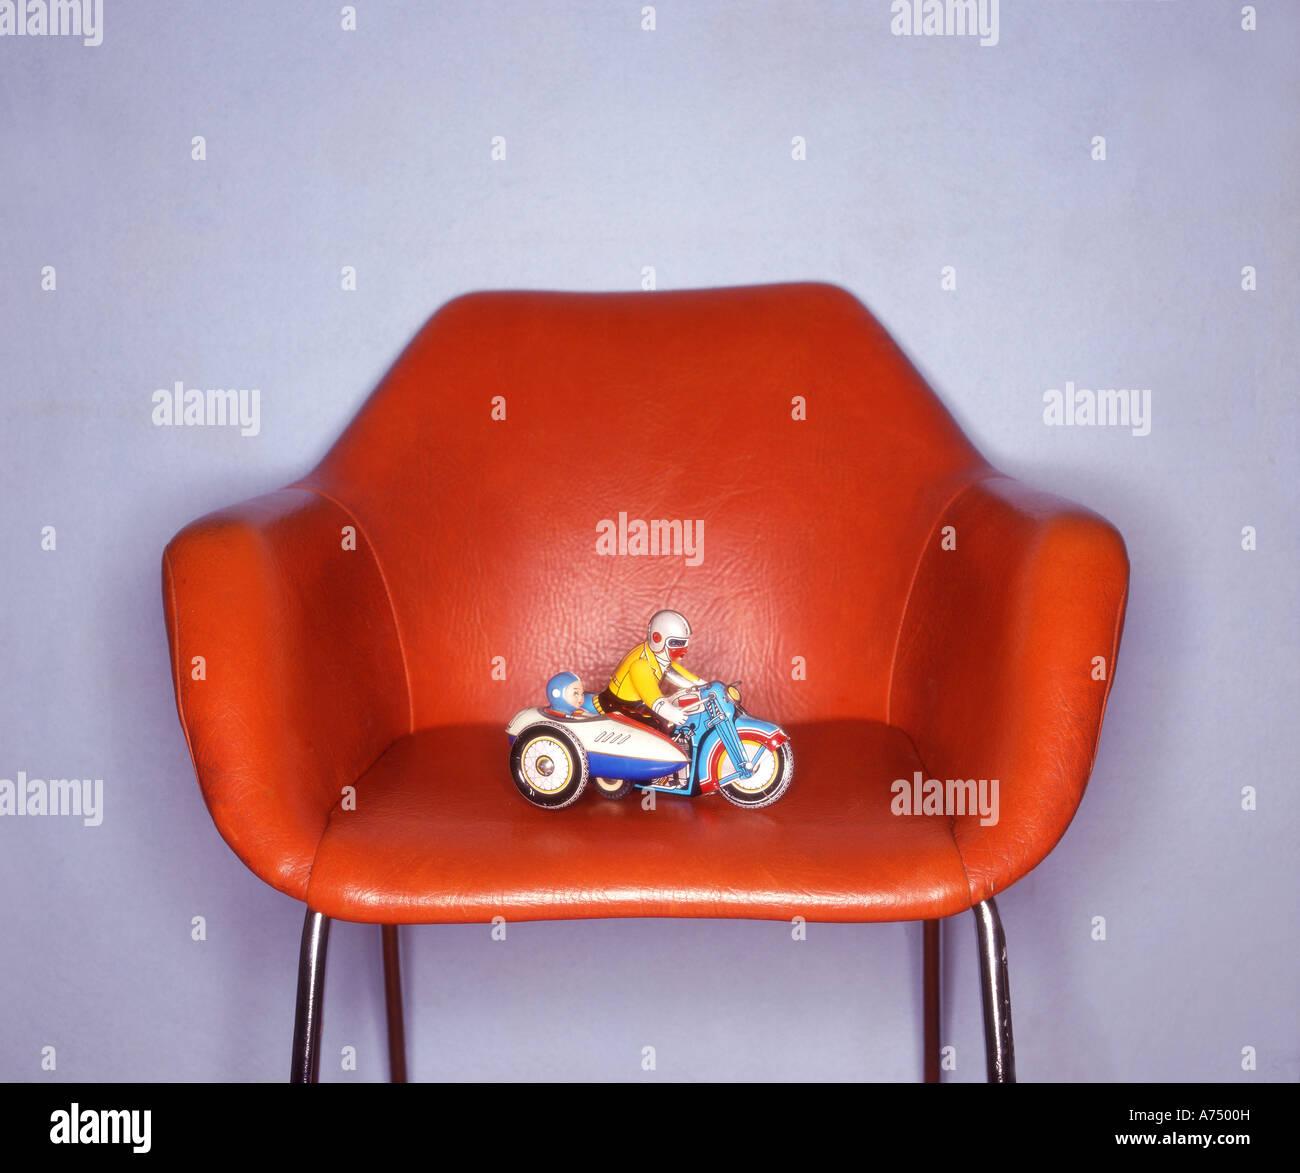 Juguete retro en silla retro iluminada por ringflash Imagen De Stock